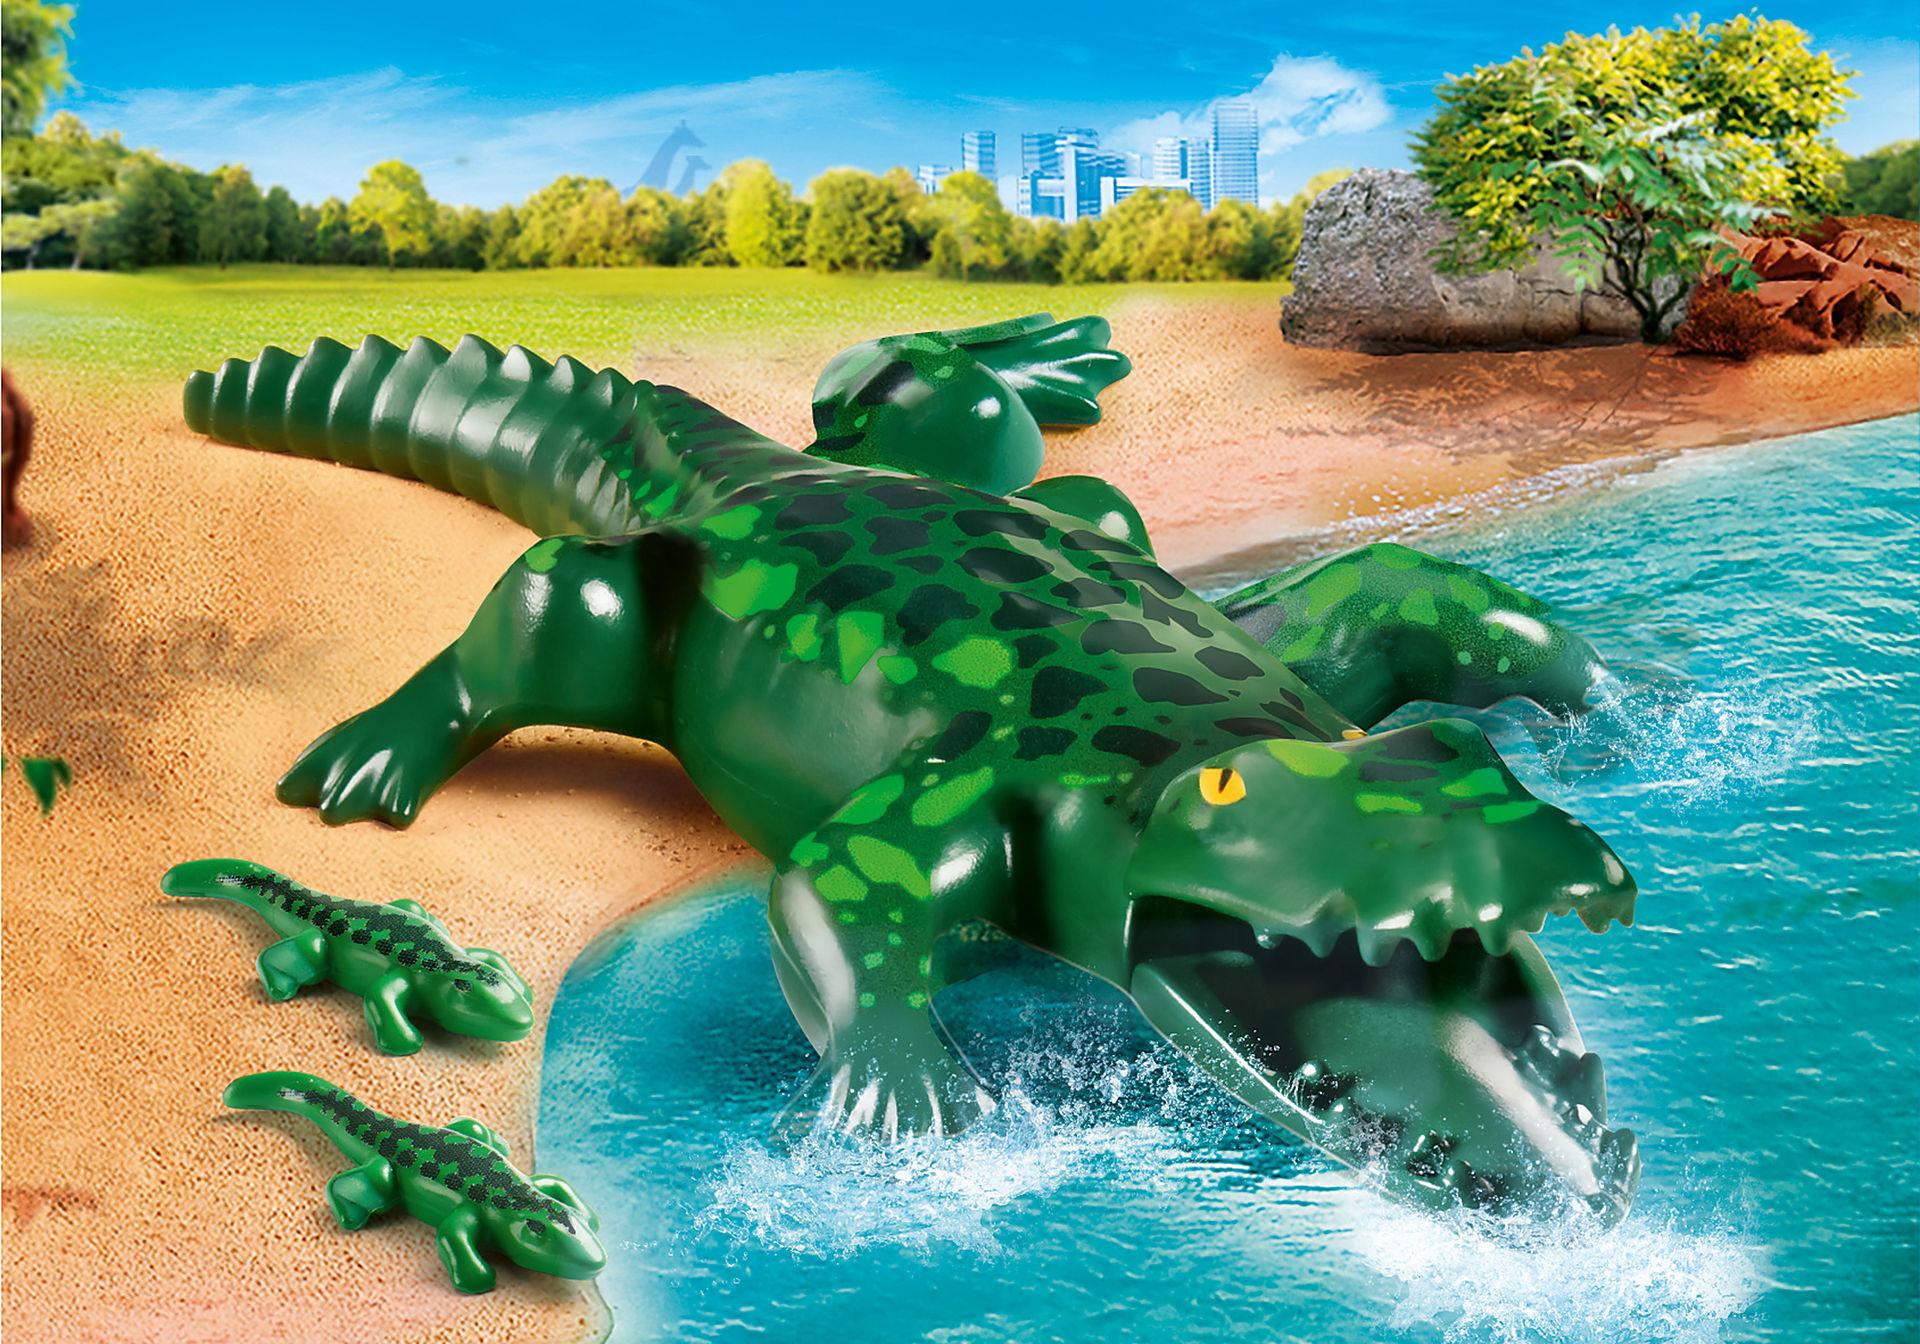 70358 Alligator mit Babys zoom image1